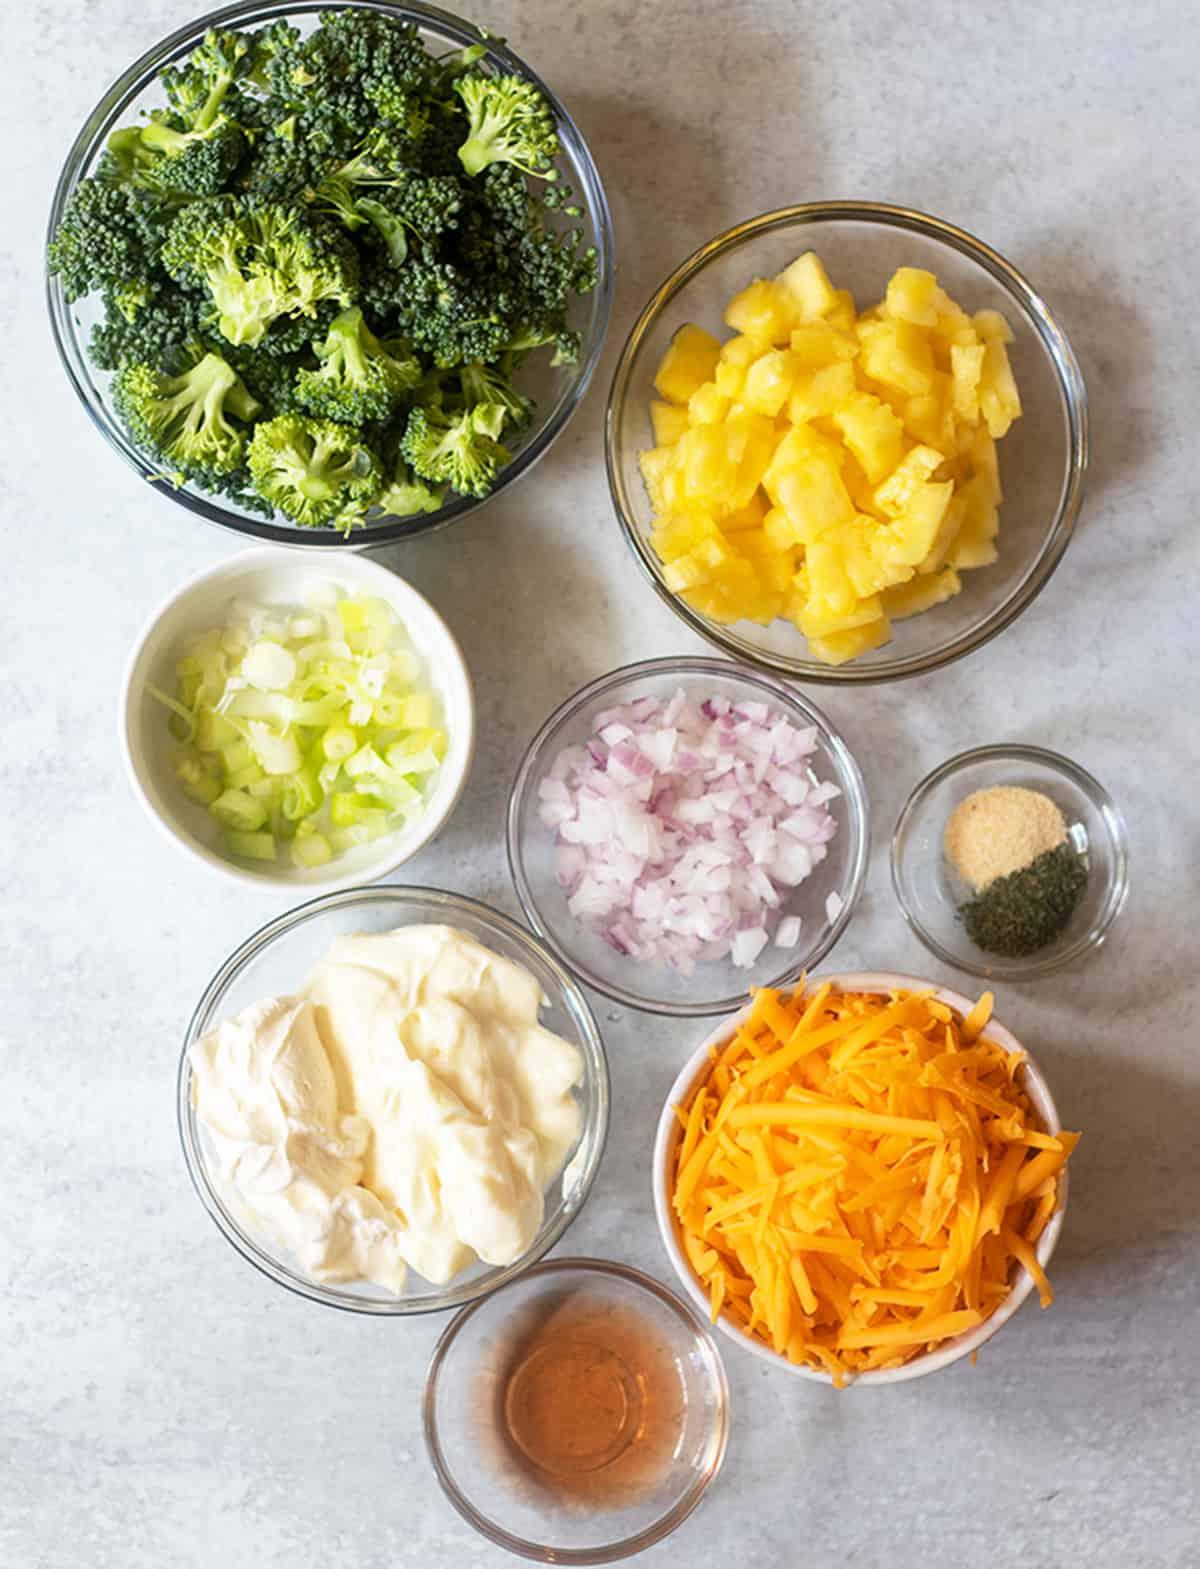 broccoli florets, diced pineapple, red onion, mayo, seasonings, shredded cheddar cheese, green onions, vingegar